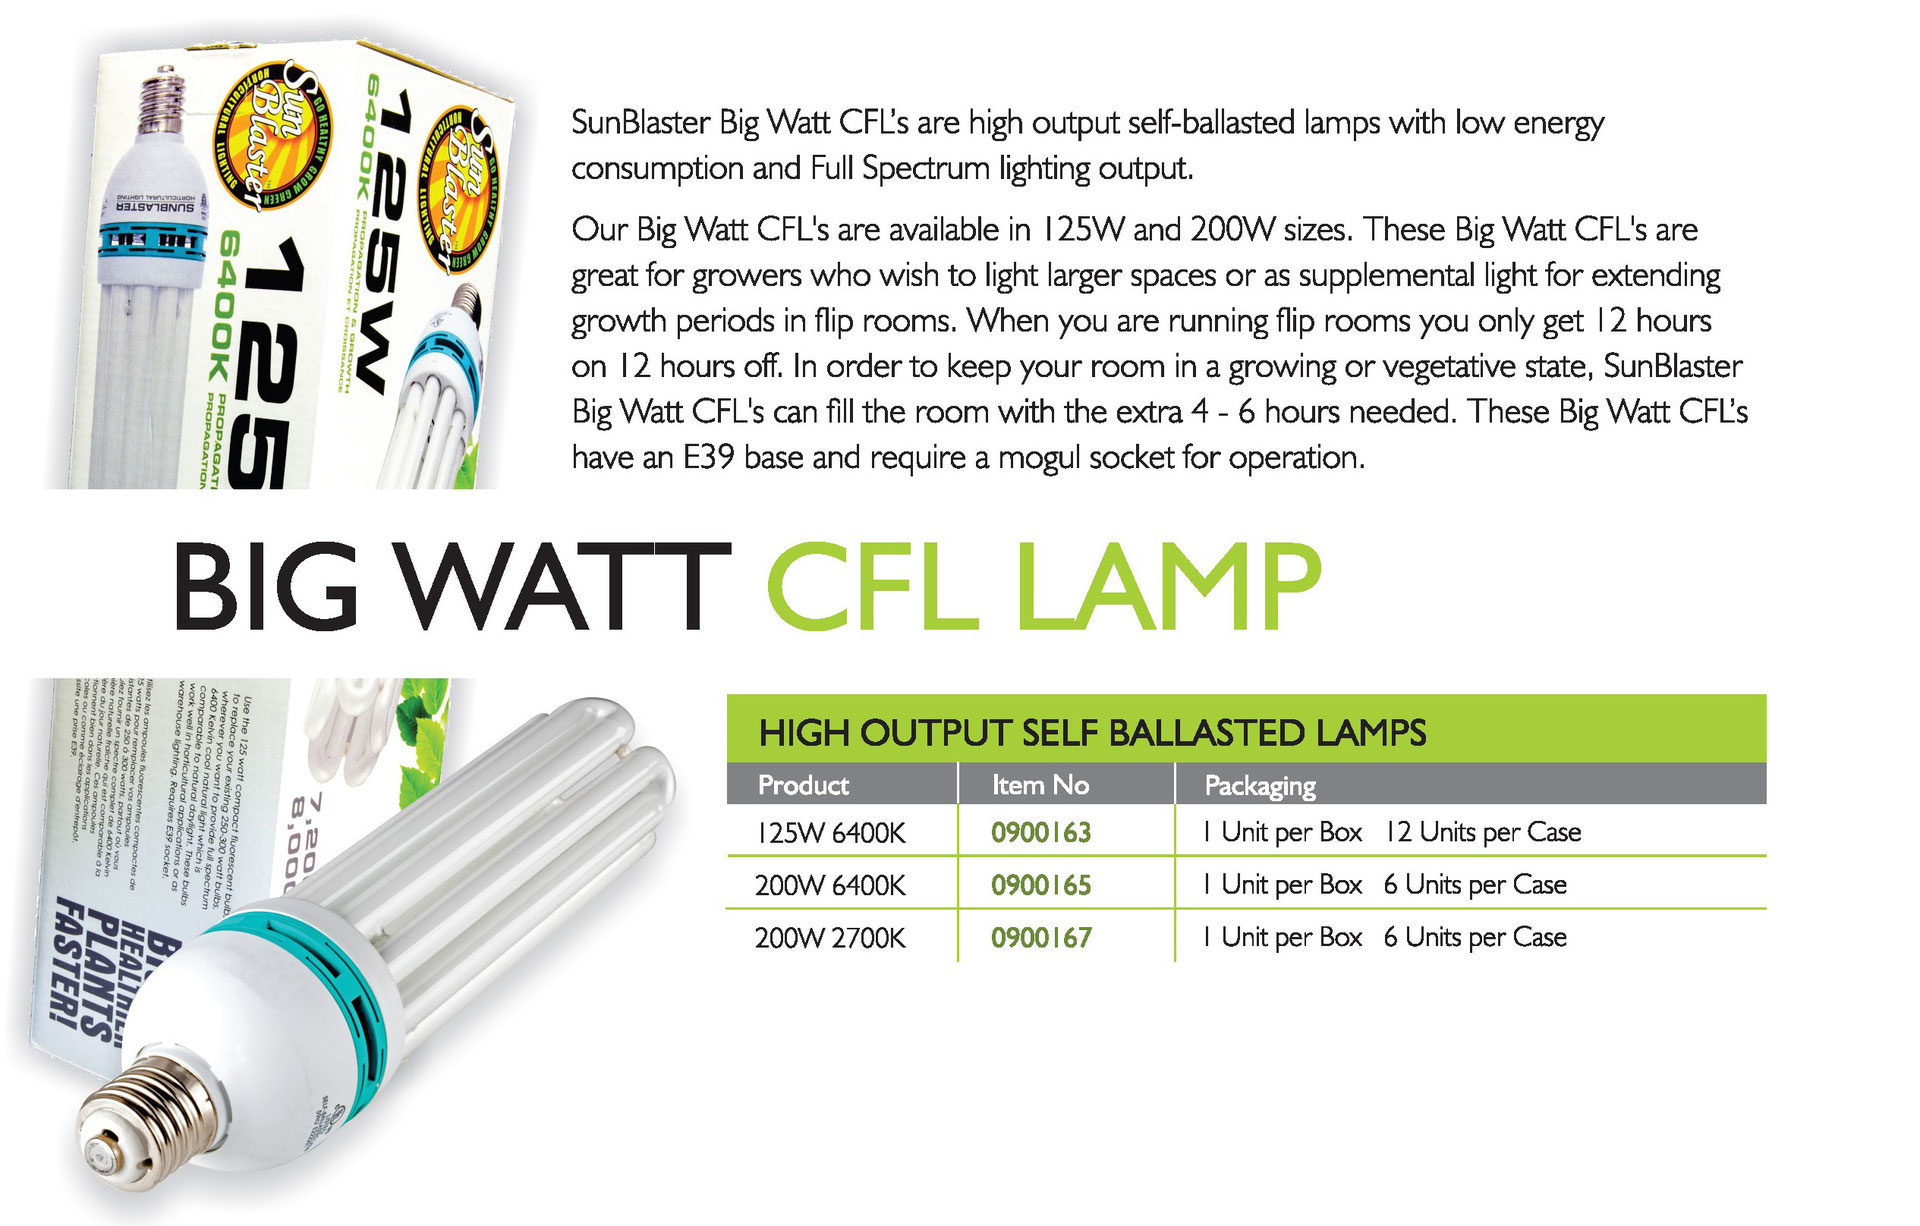 Small Watt Cfl S Sunblaster Lighting